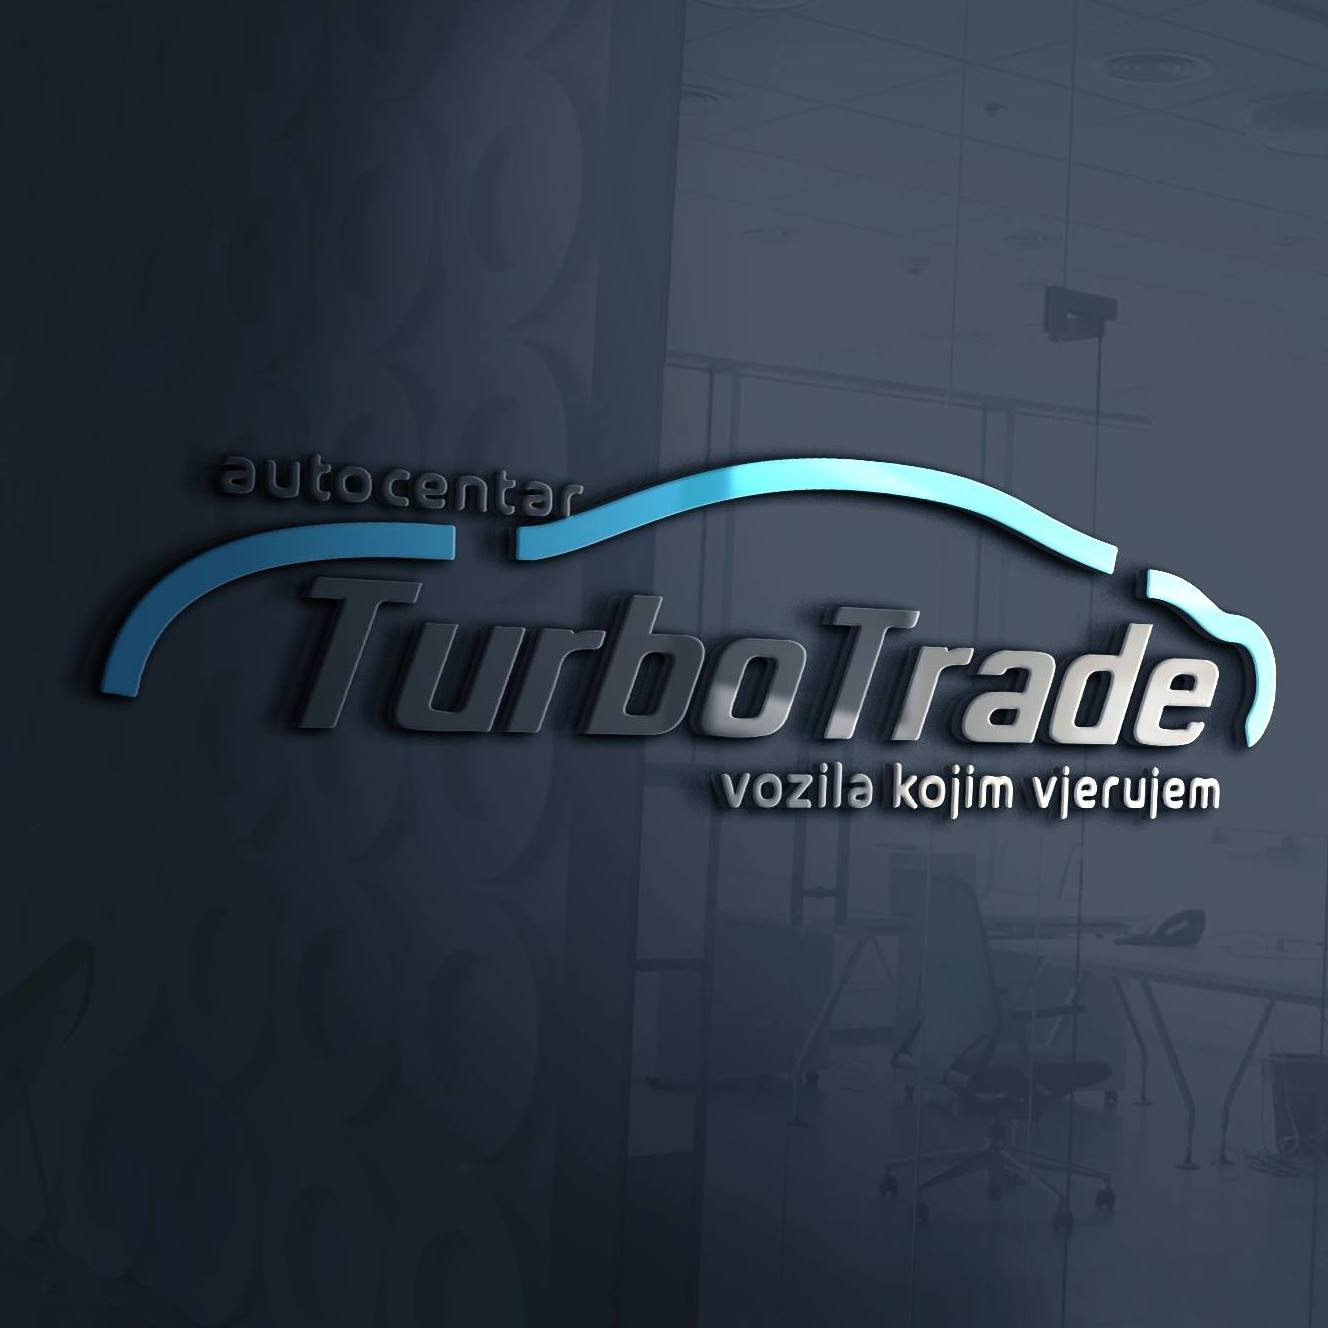 Turbo Trade